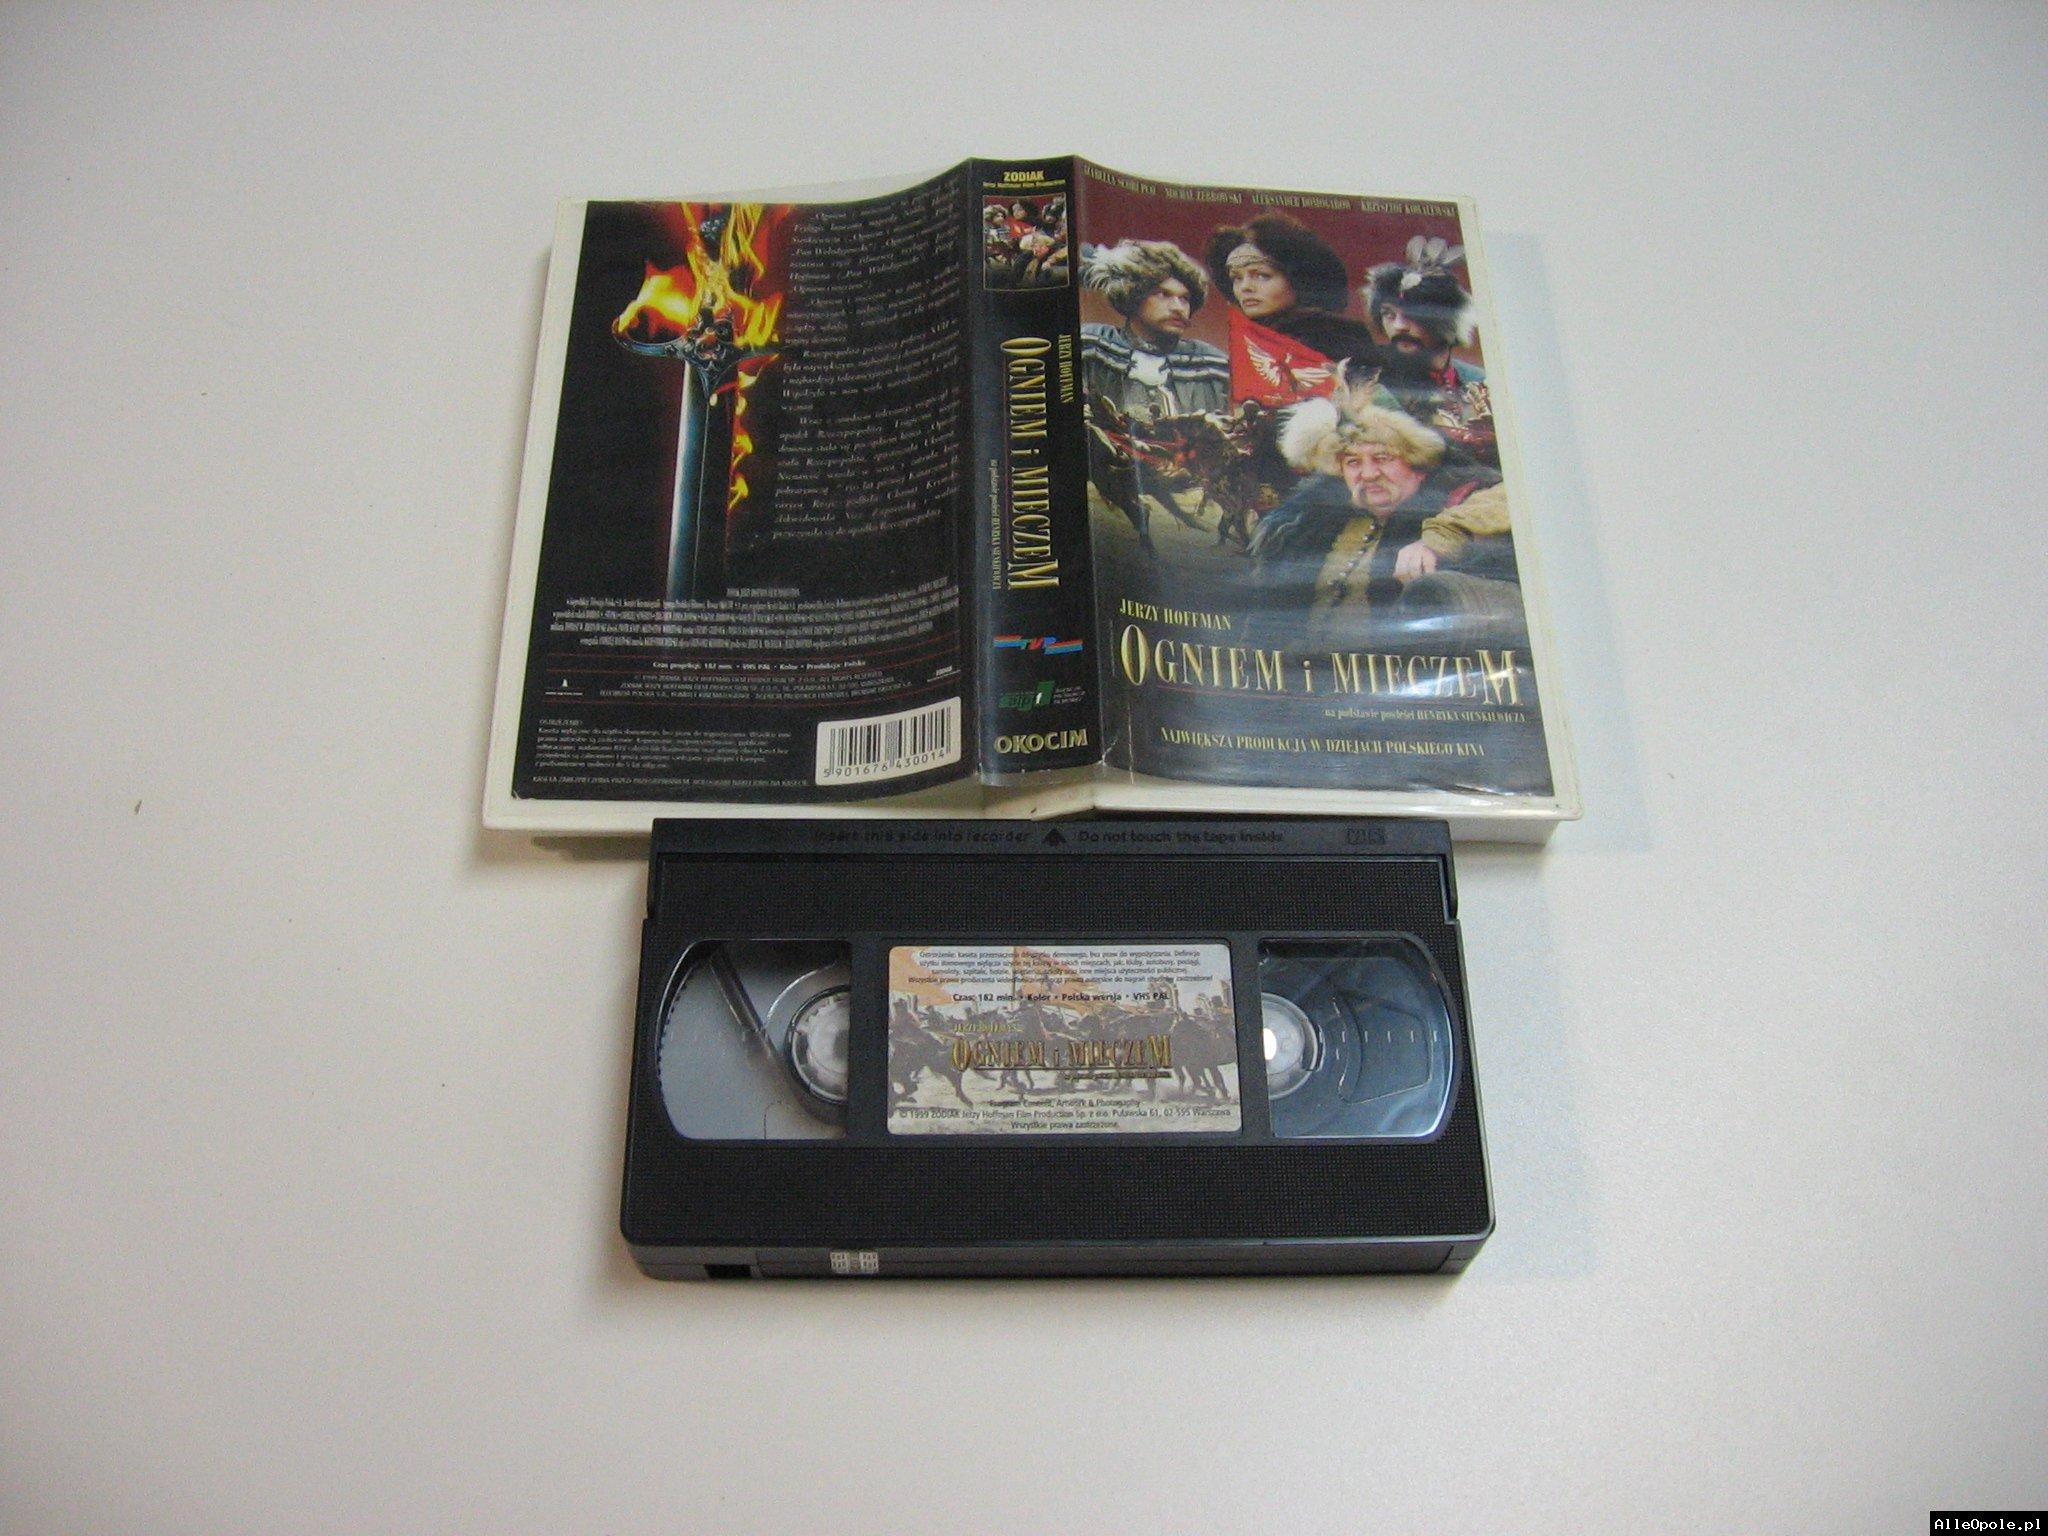 OGNIEM I MIECZEM - VHS Kaseta Video - Opole 1804